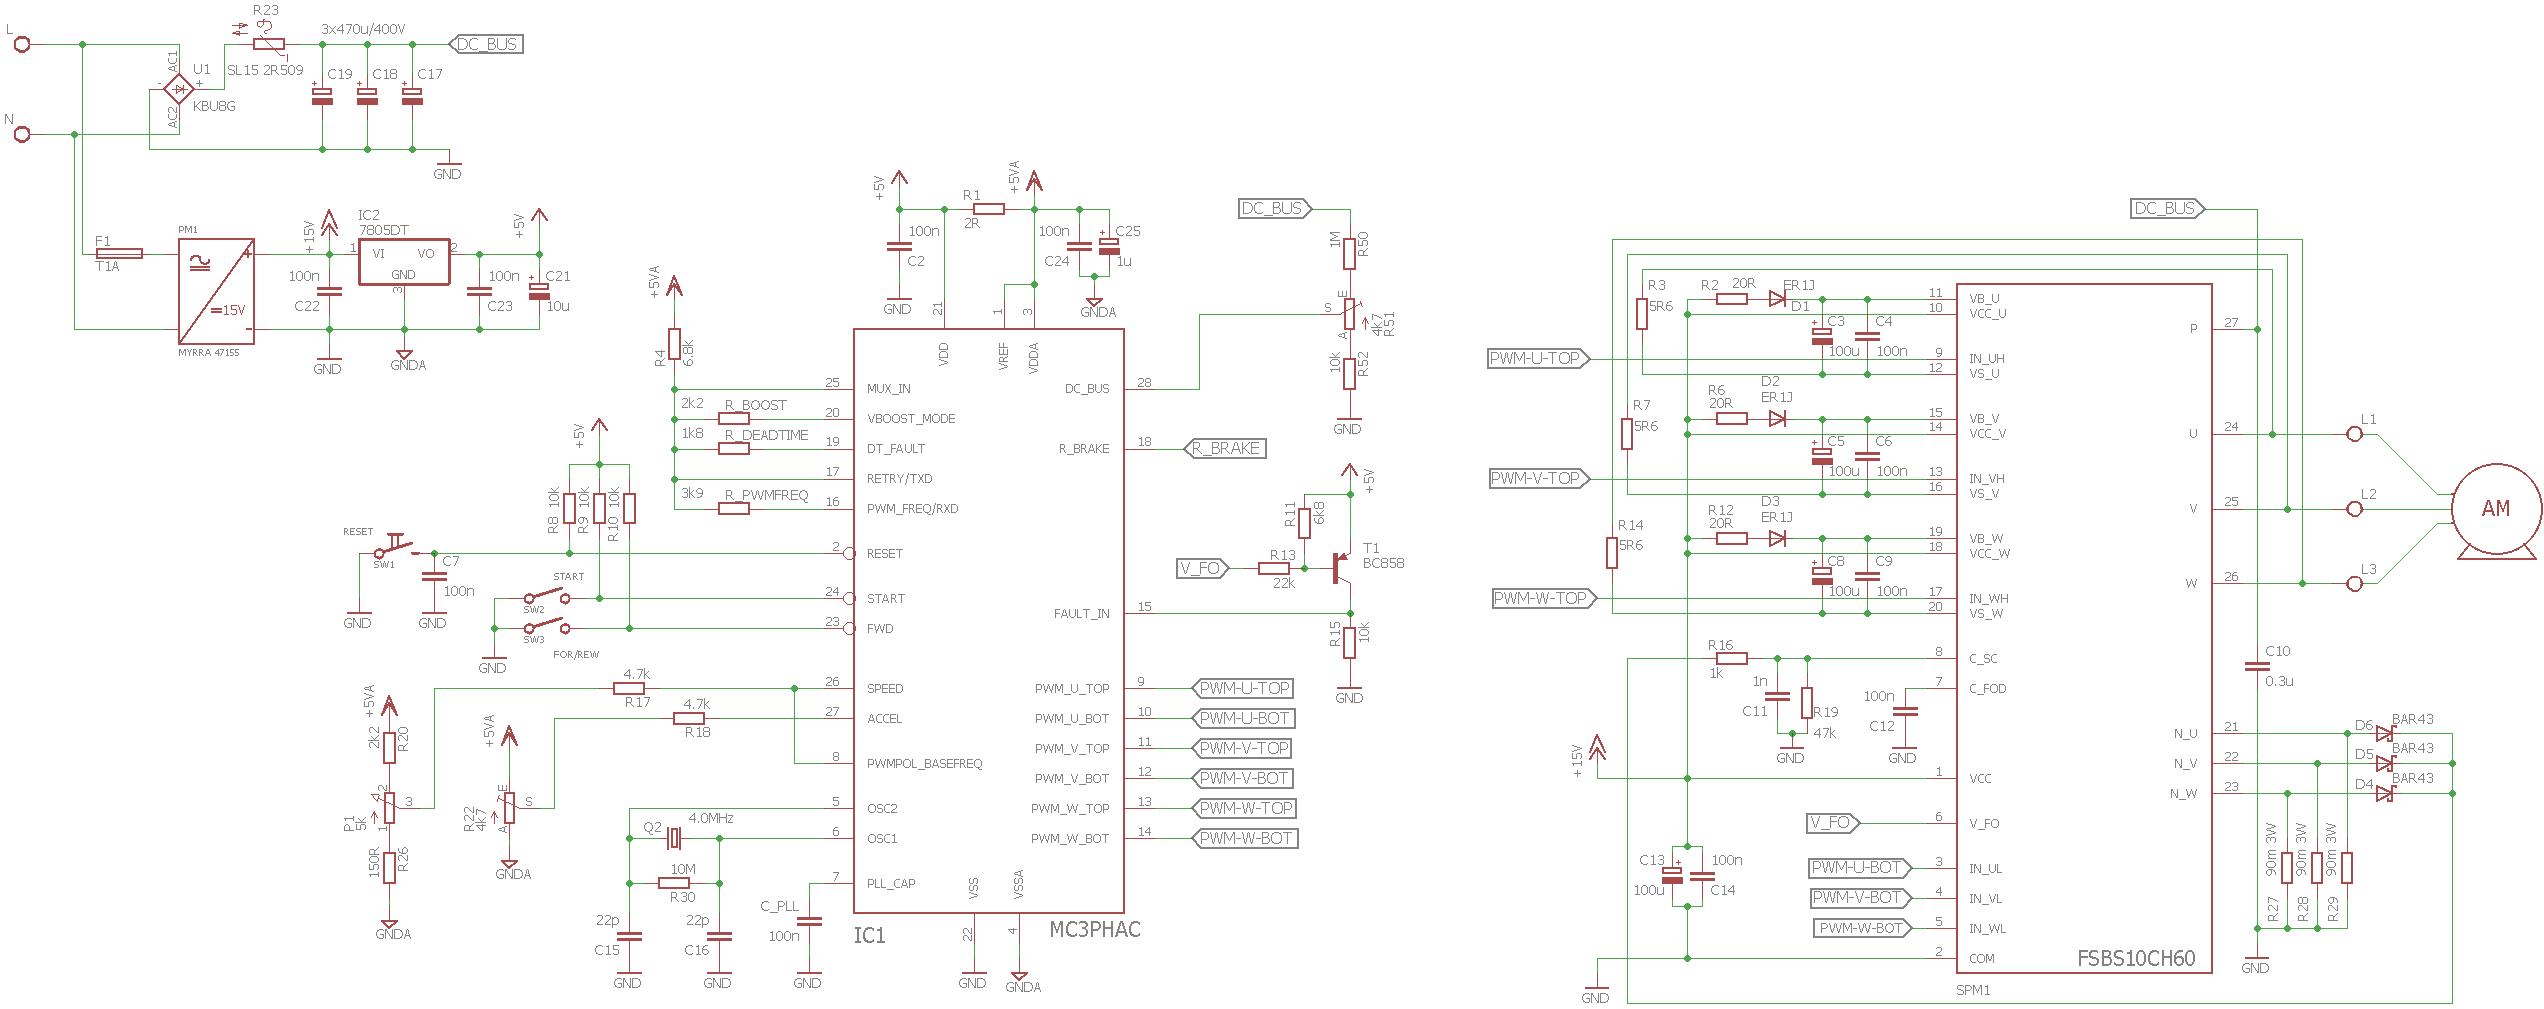 mc3phac-motor-controller-inverter-ac-motor-drives-schematic  Phase Motor Wiring Circuit Diagram on 3 phase motor connection diagram, 3 phase transformer circuit diagram, 3 phase starter diagram, motor starter wiring diagram, 3 phase motor electrical schematics, 3 phase wiring schematic, 3 phase electric panel diagrams,